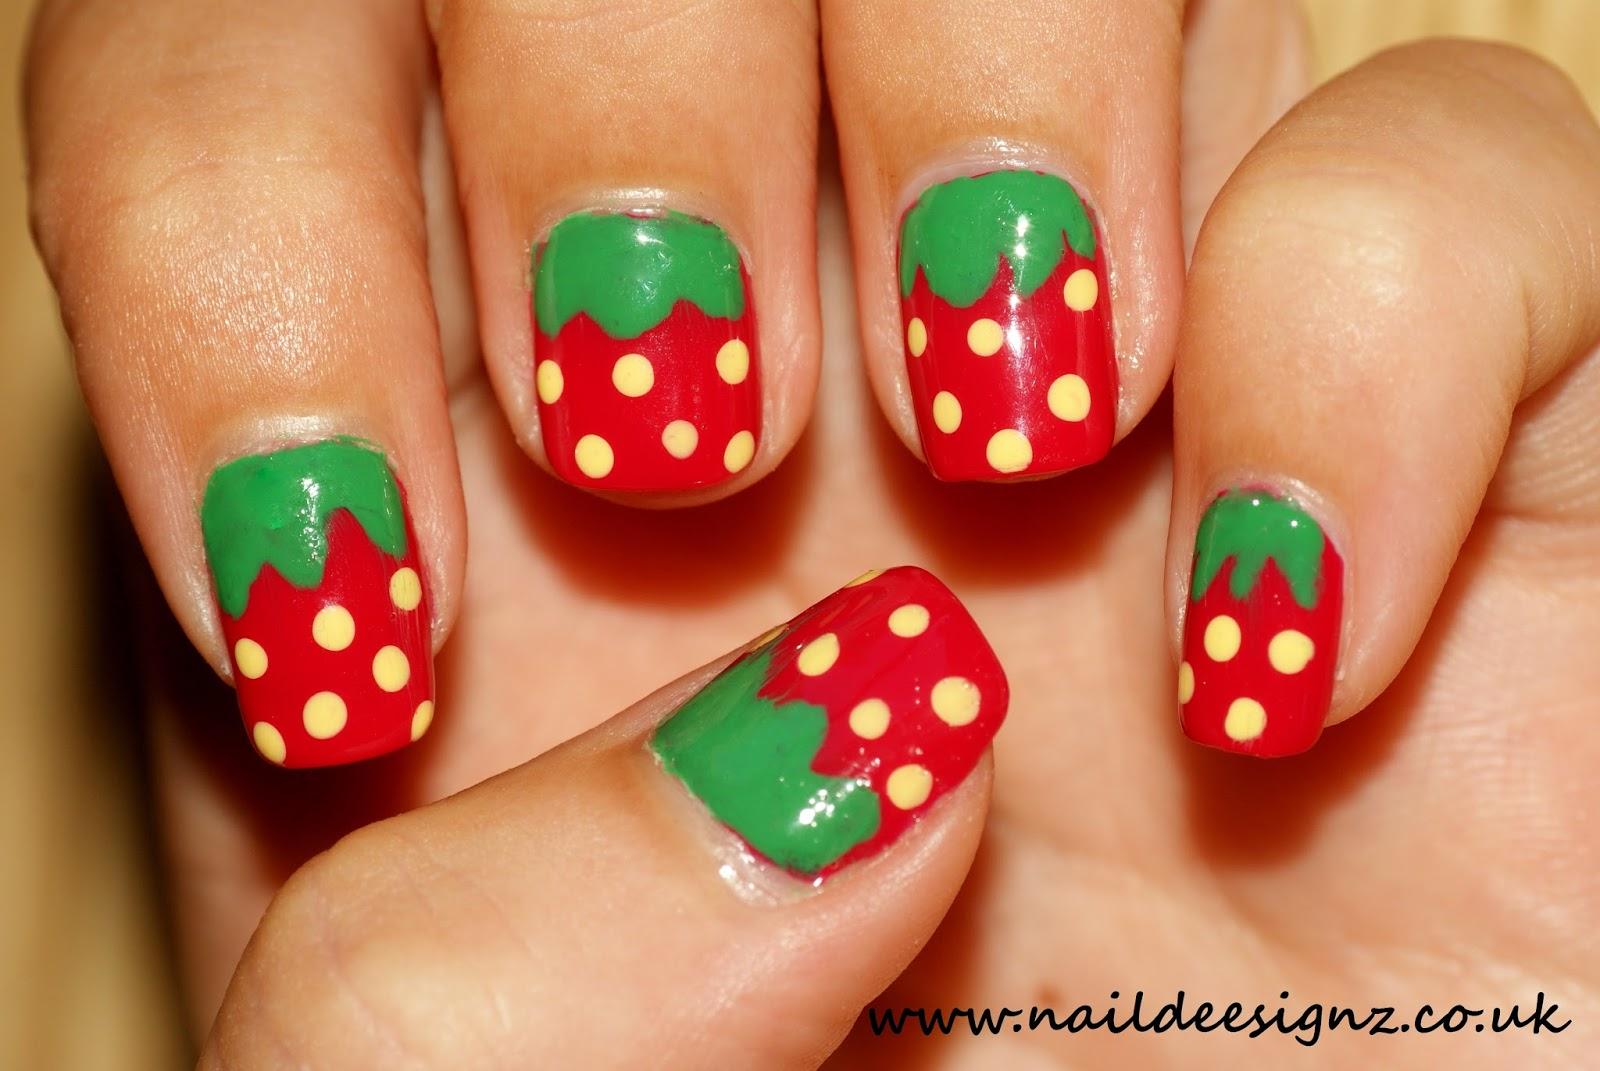 NailDeesignz: Strawberry Nail Art